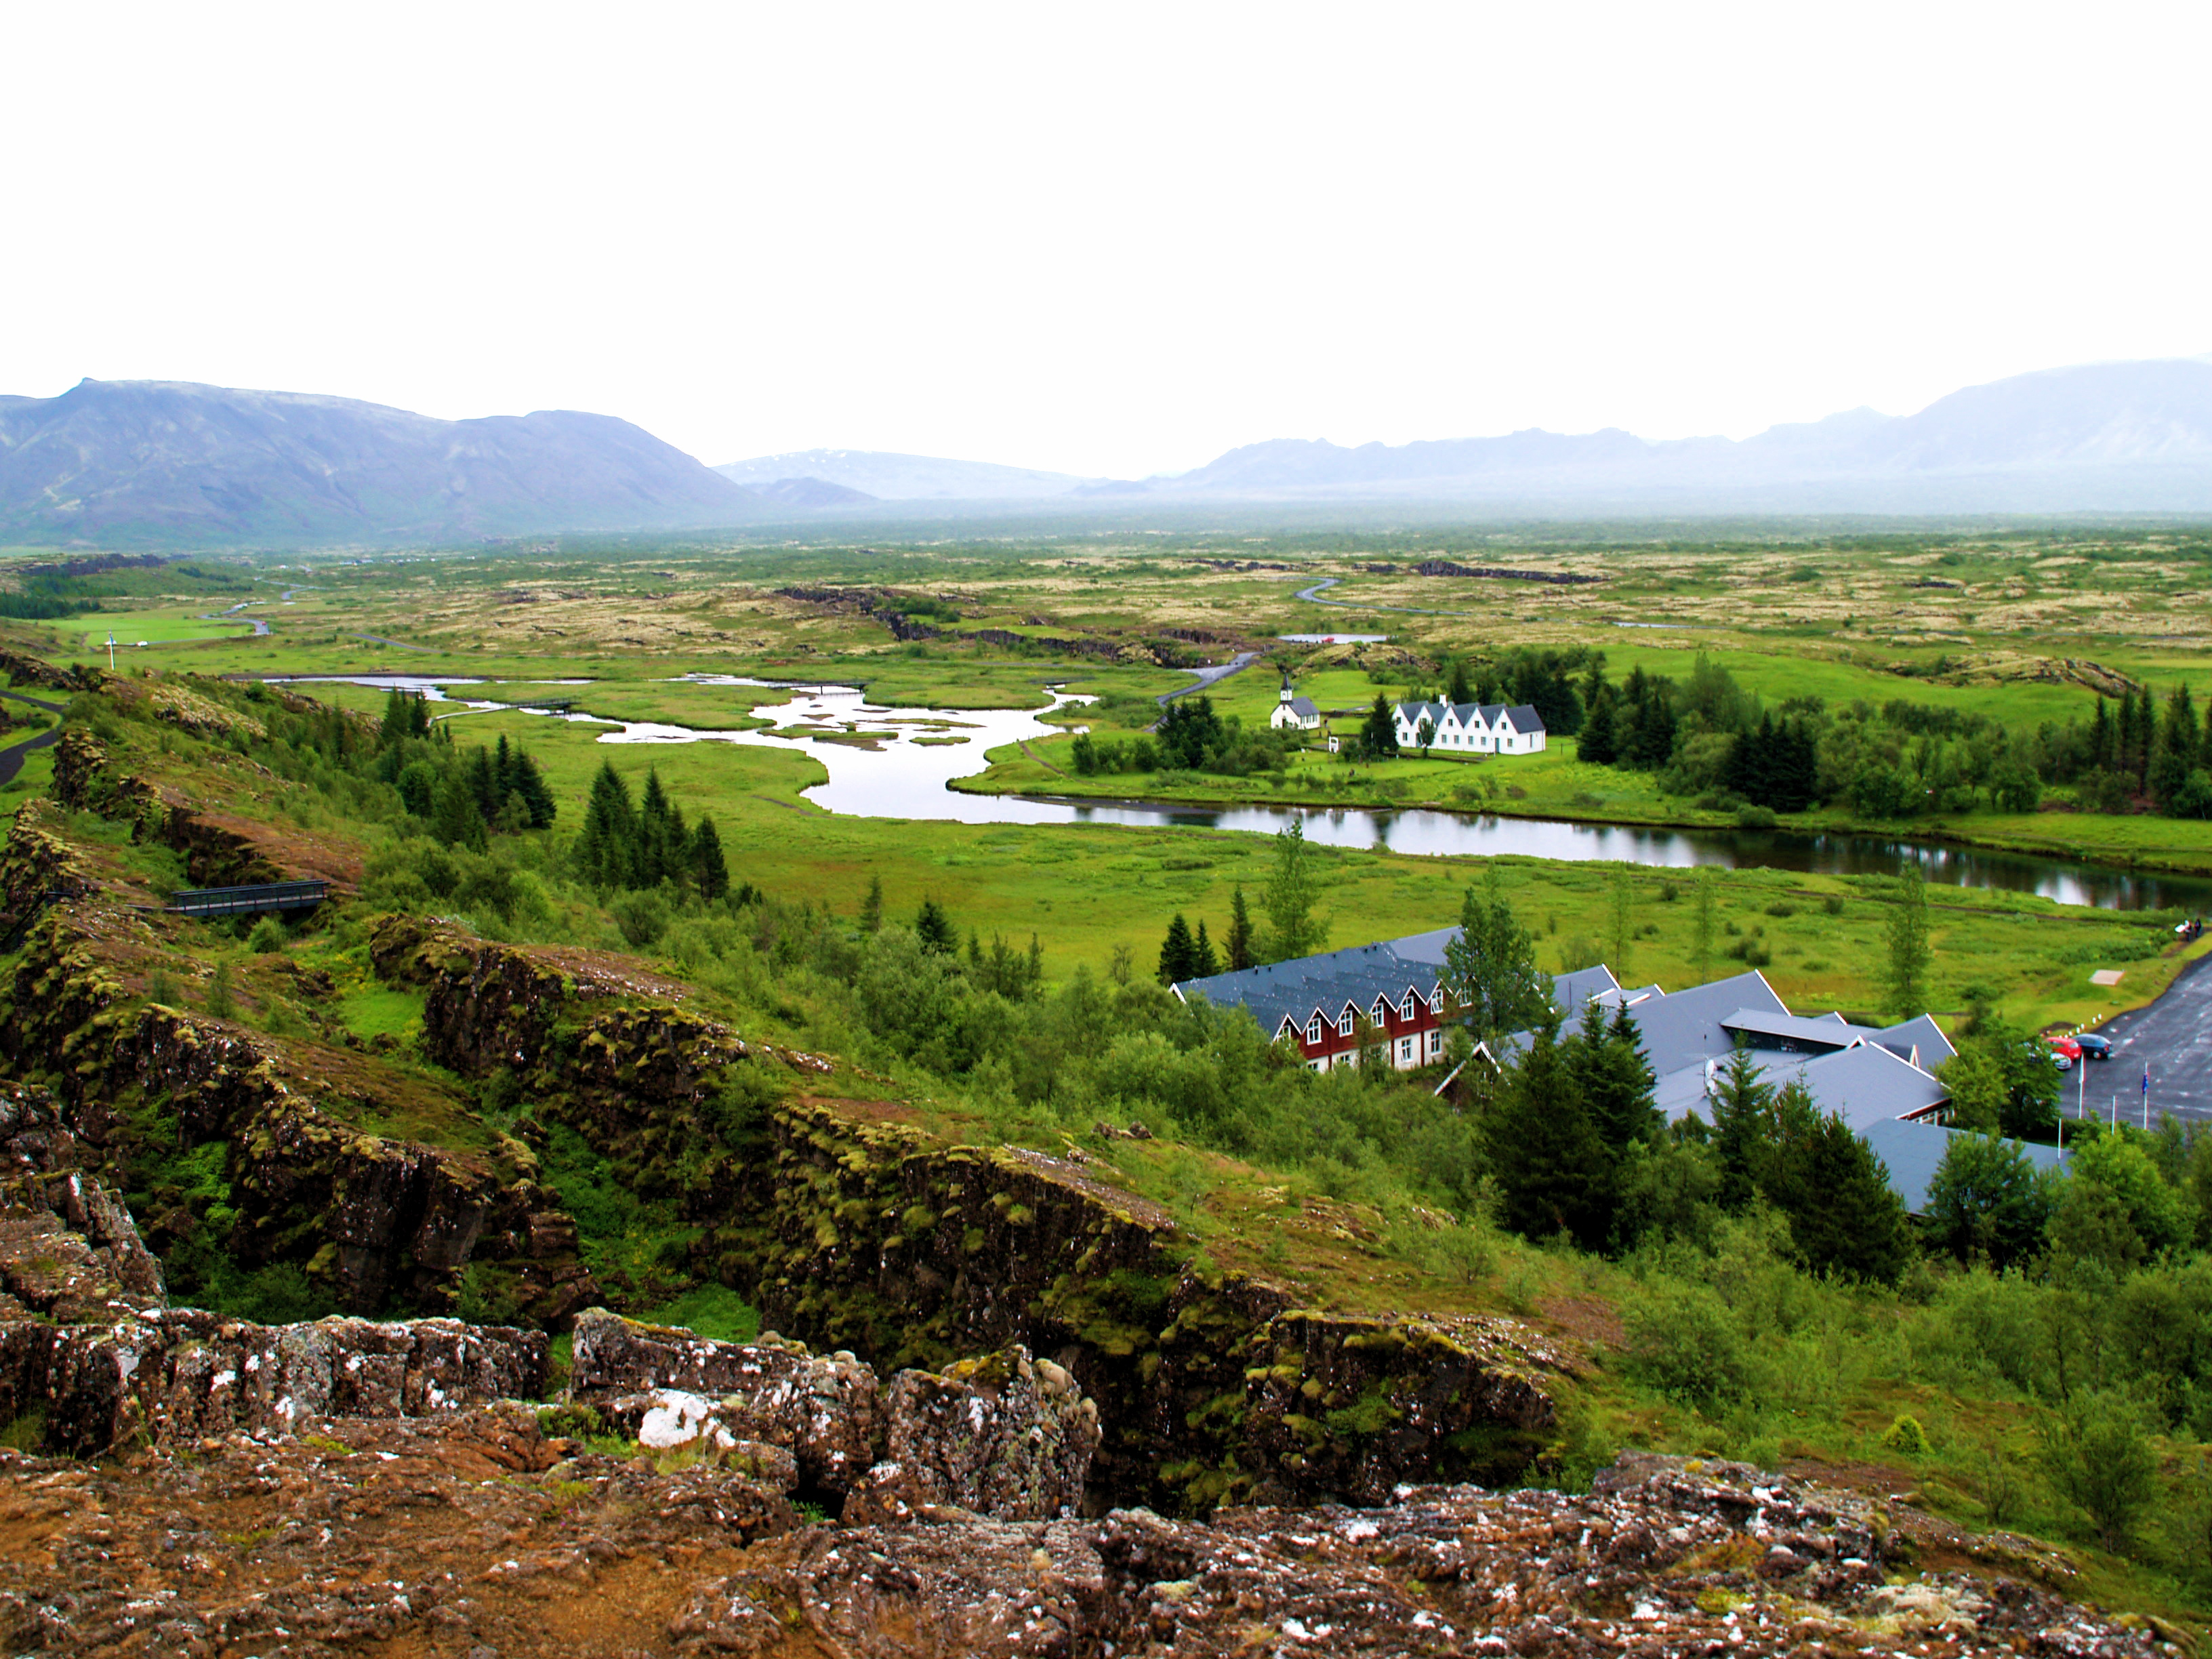 File:Thingvellir National Park.jpg - Wikimedia Commons